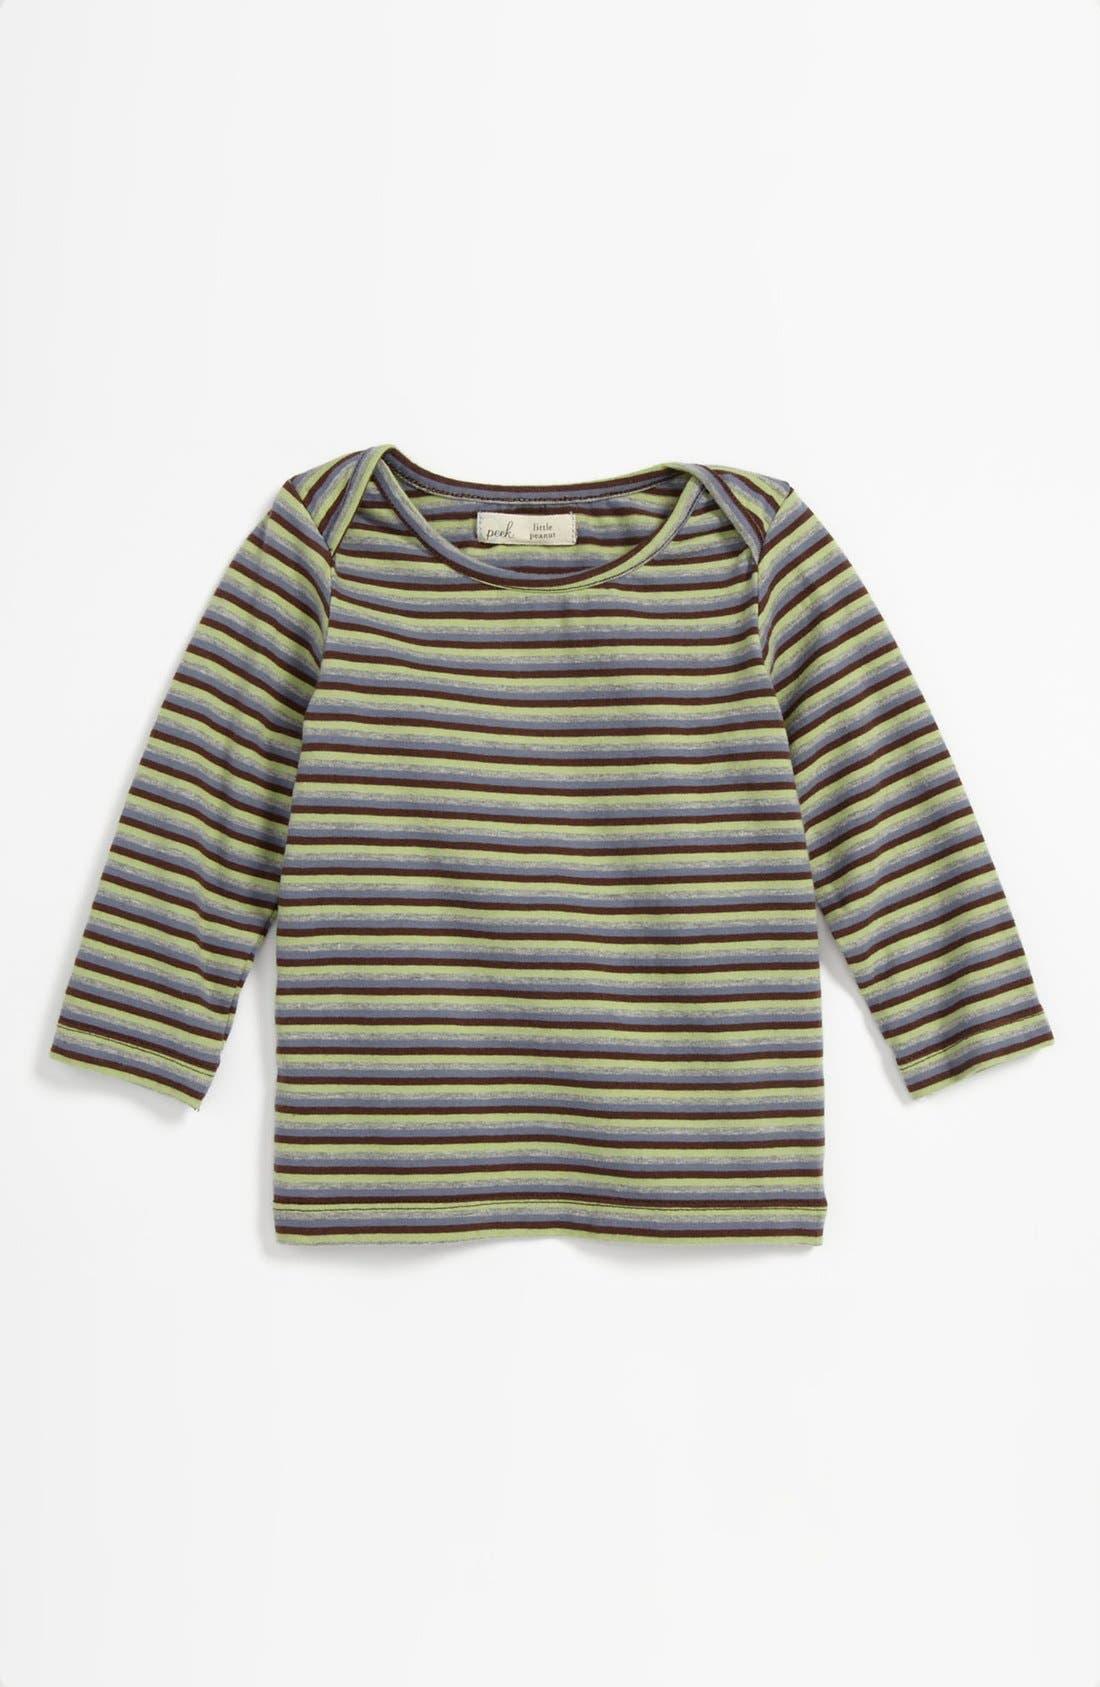 Main Image - Peek 'Little Peanut - Alphie' T-Shirt (Baby)